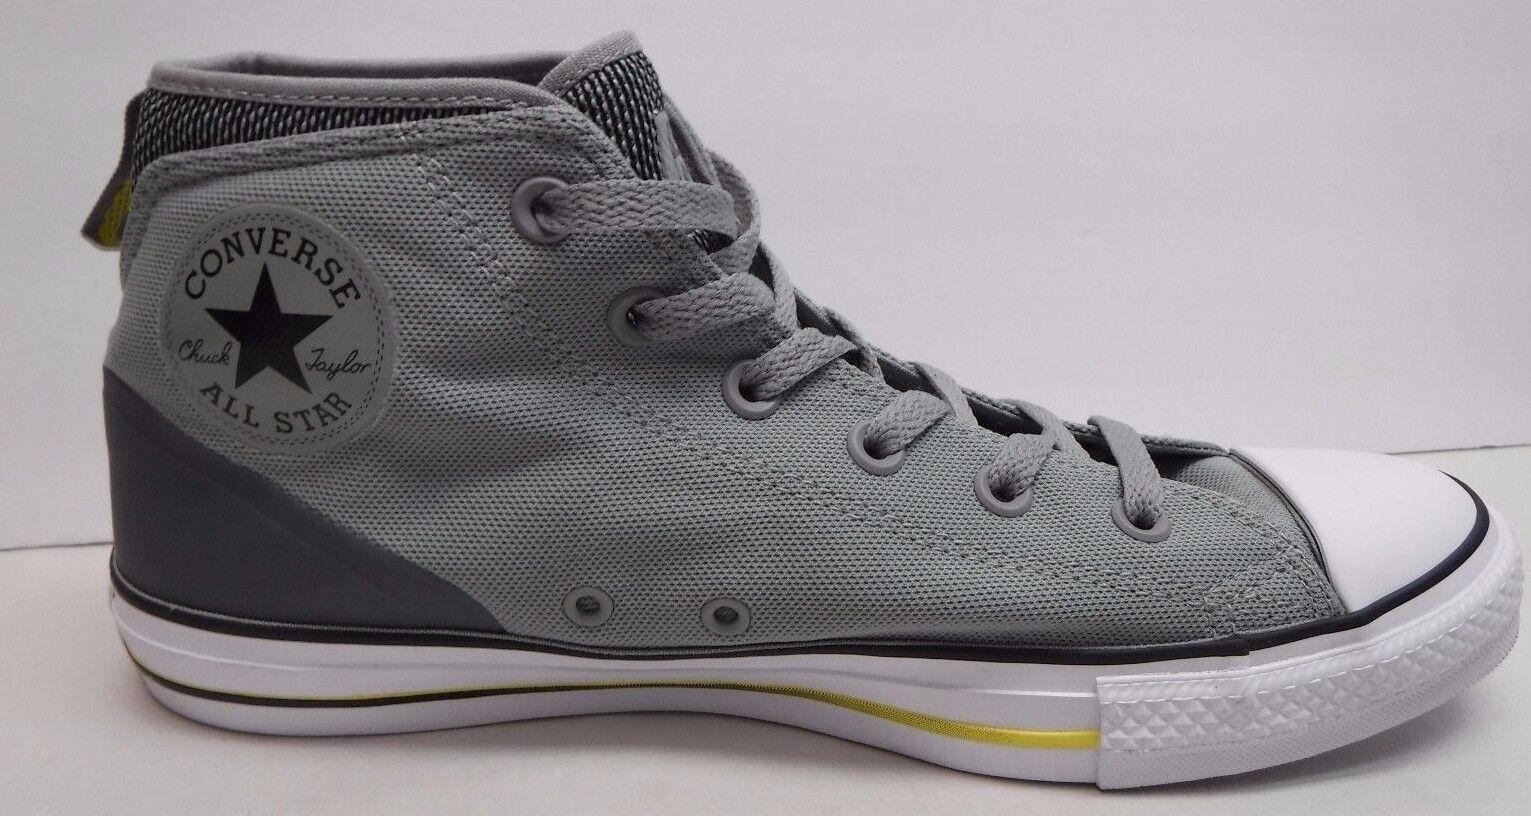 Converse Size 10 Grigio Hi Top Scarpe da Ginnastica New Uomo Shoes